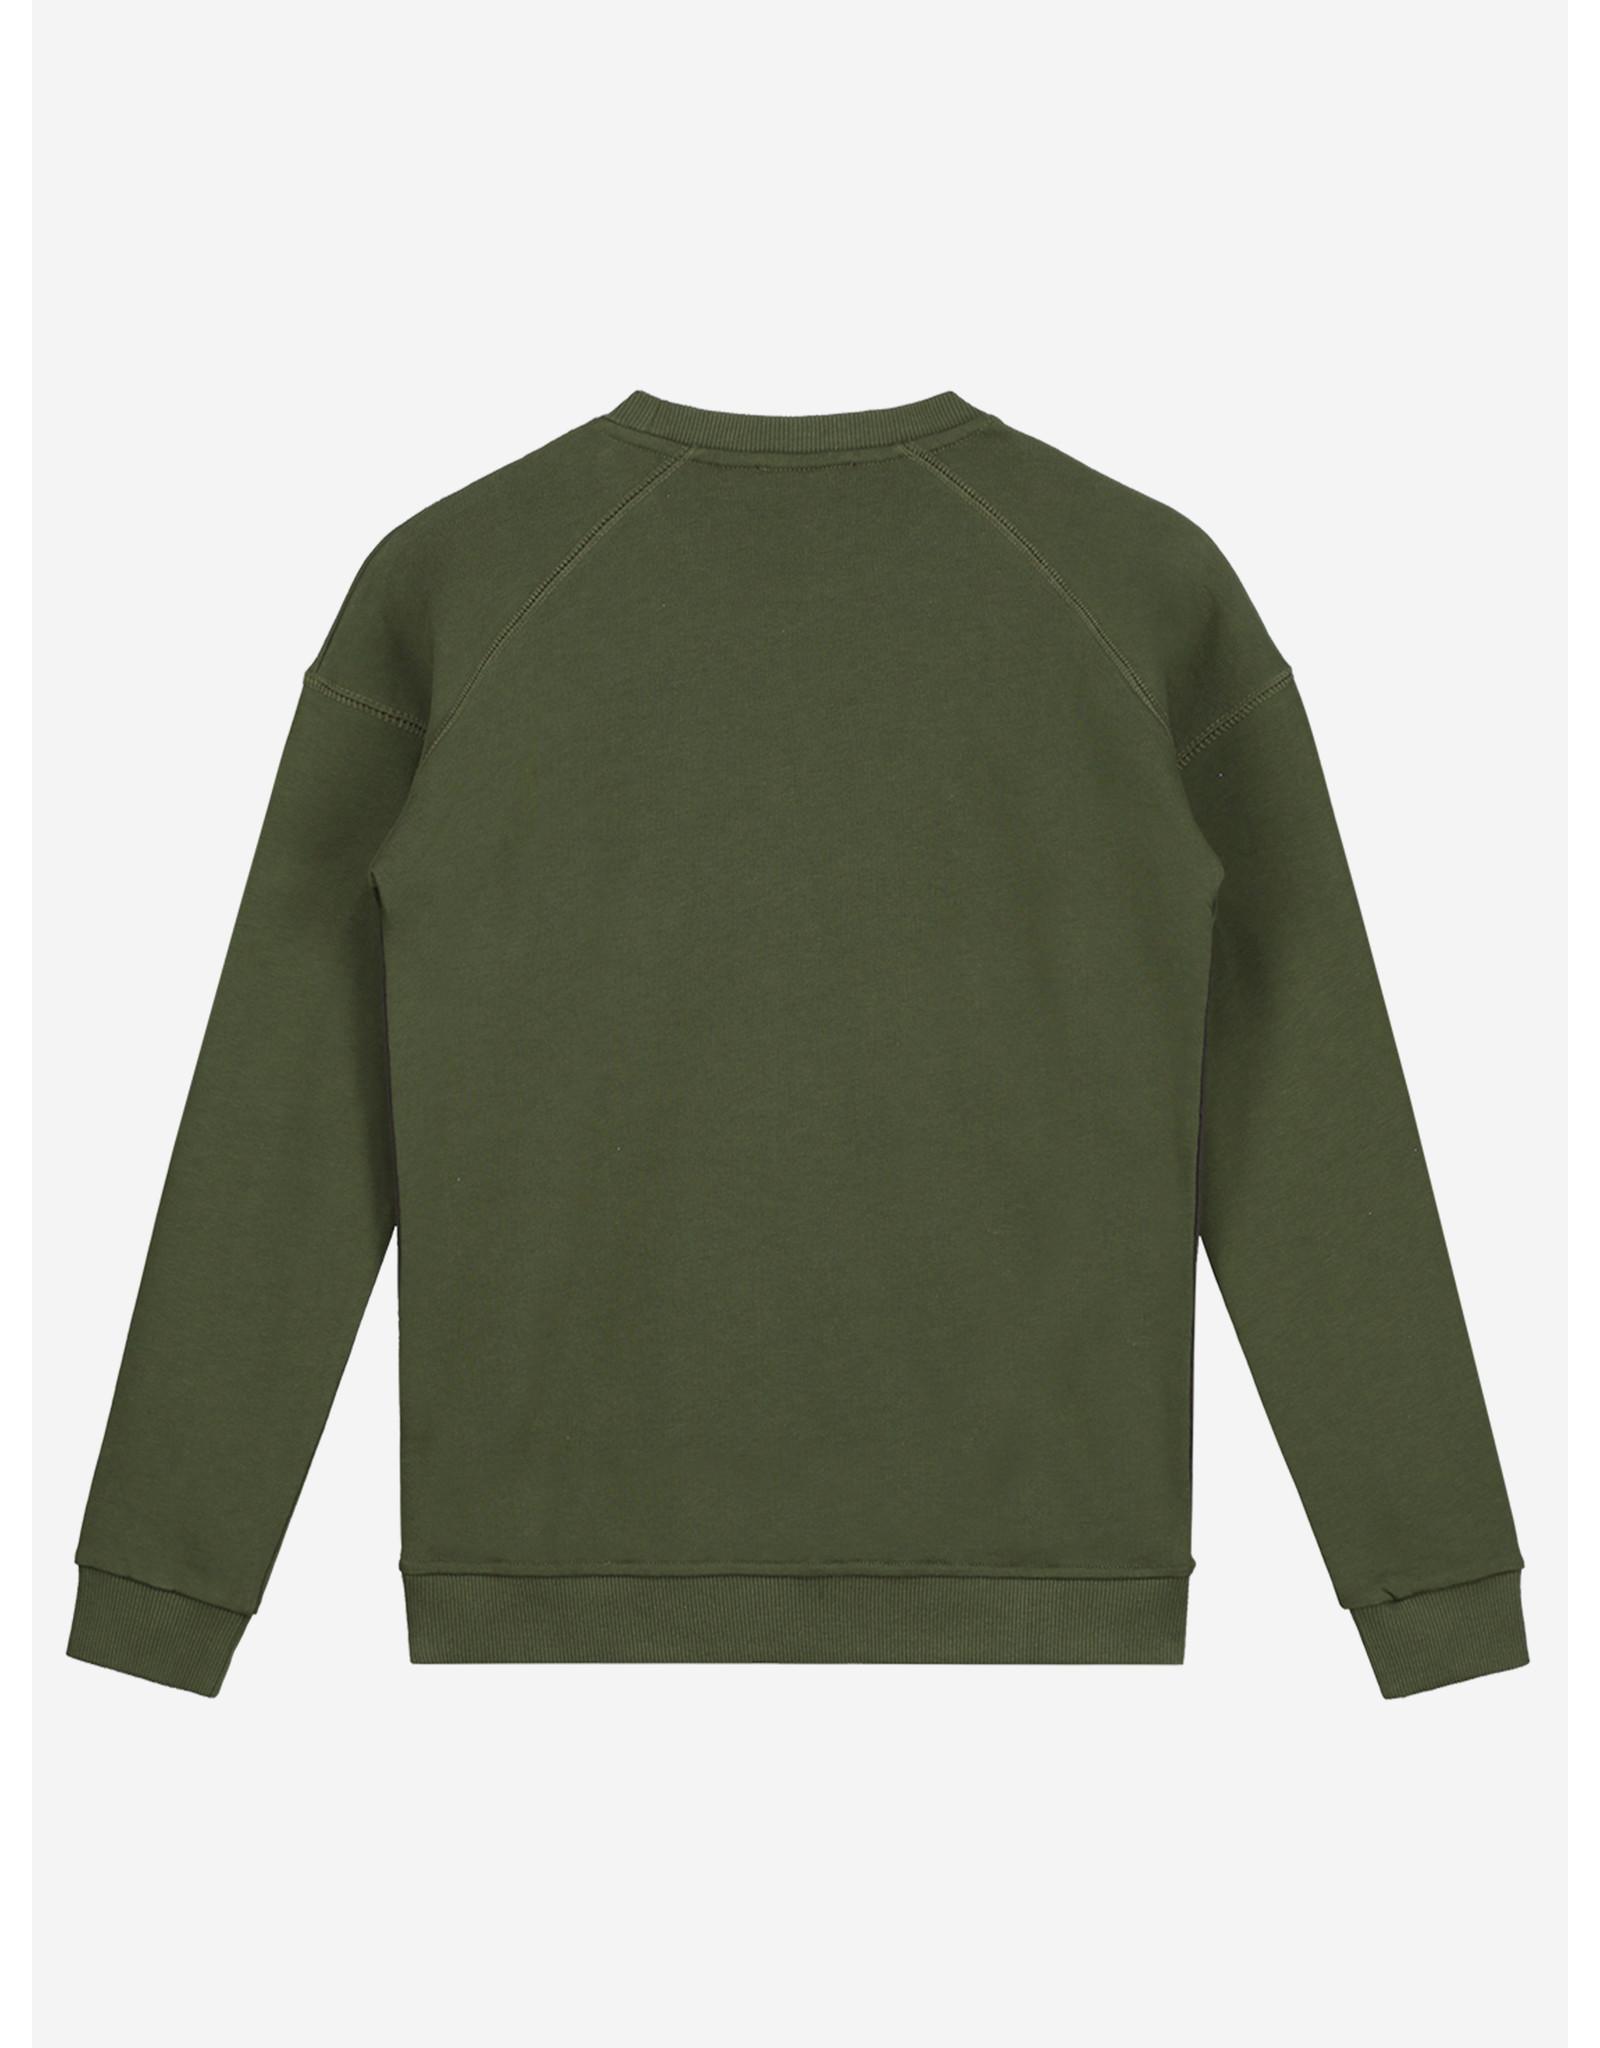 Nik&Nik Nik&Nik Monzo Sweater Dark Moss Green